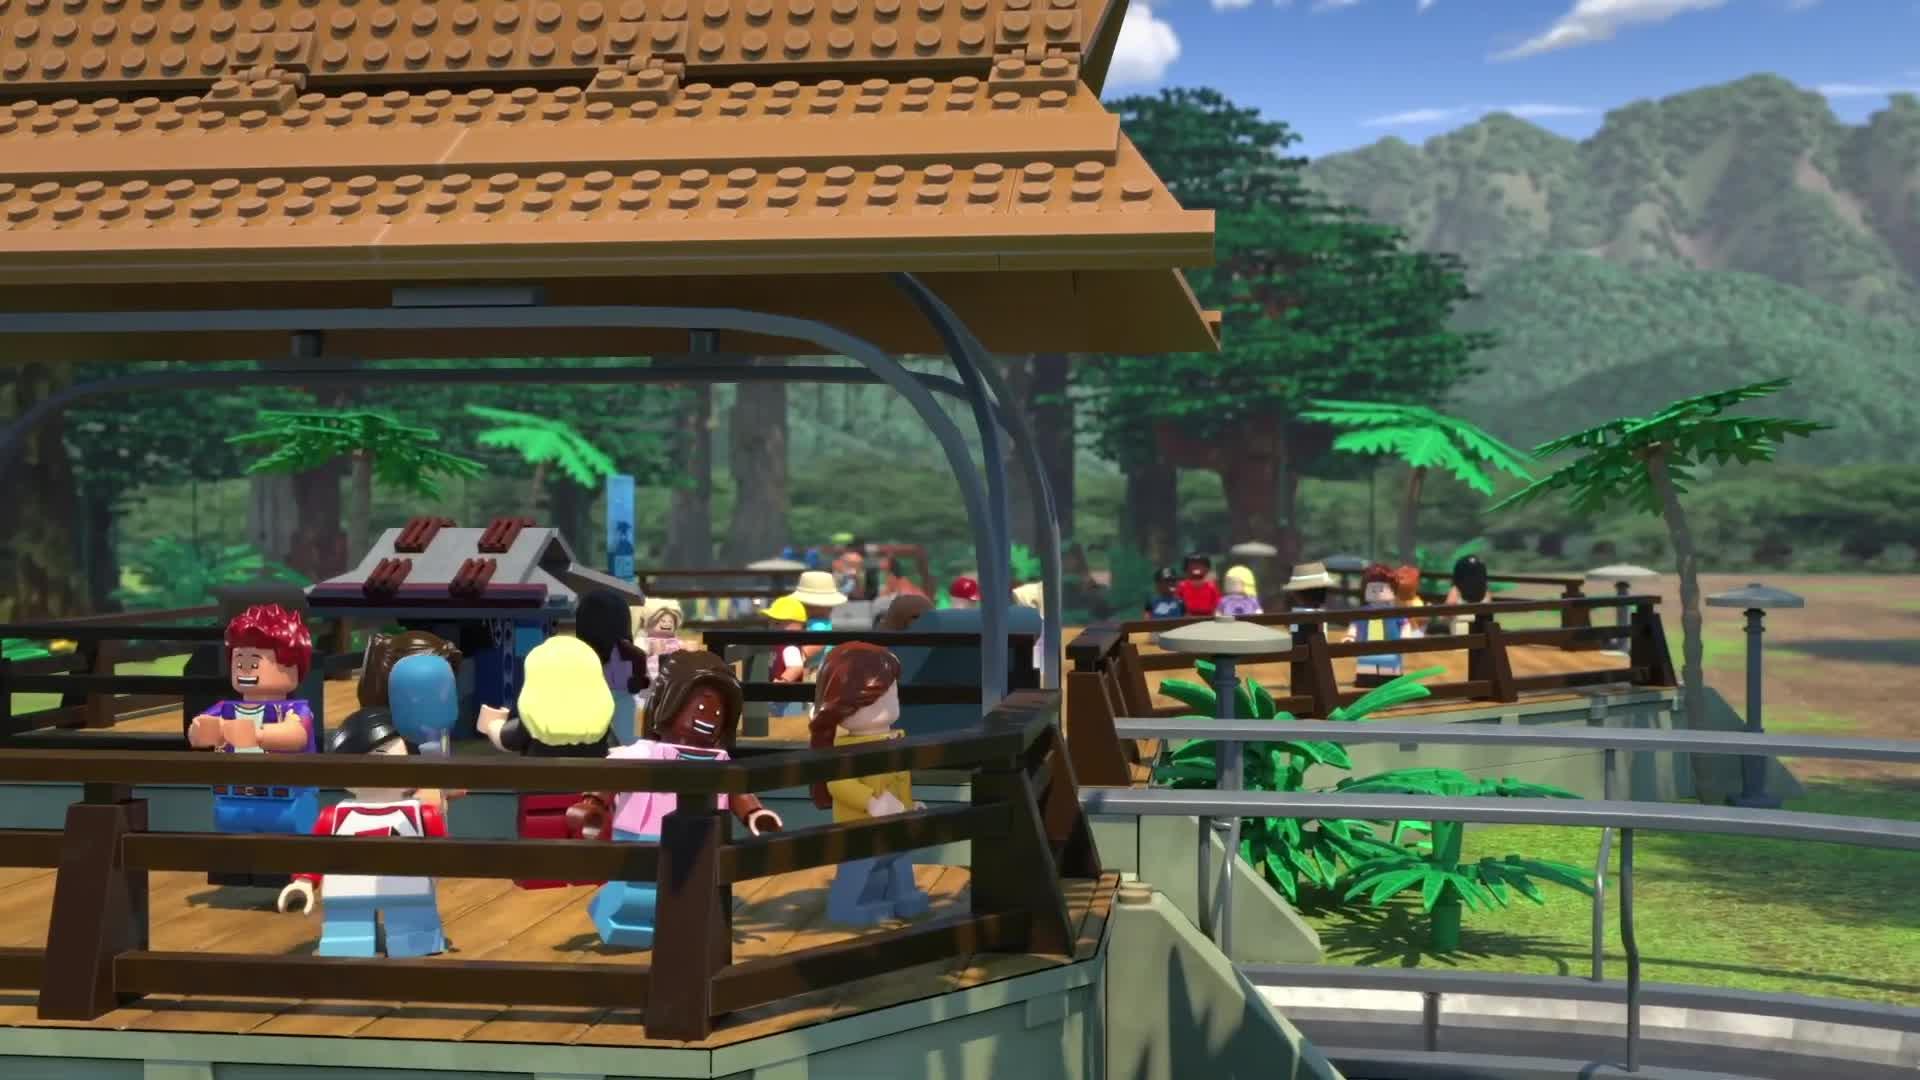 LEGO Jurassic World - First Look [HD] screen capture